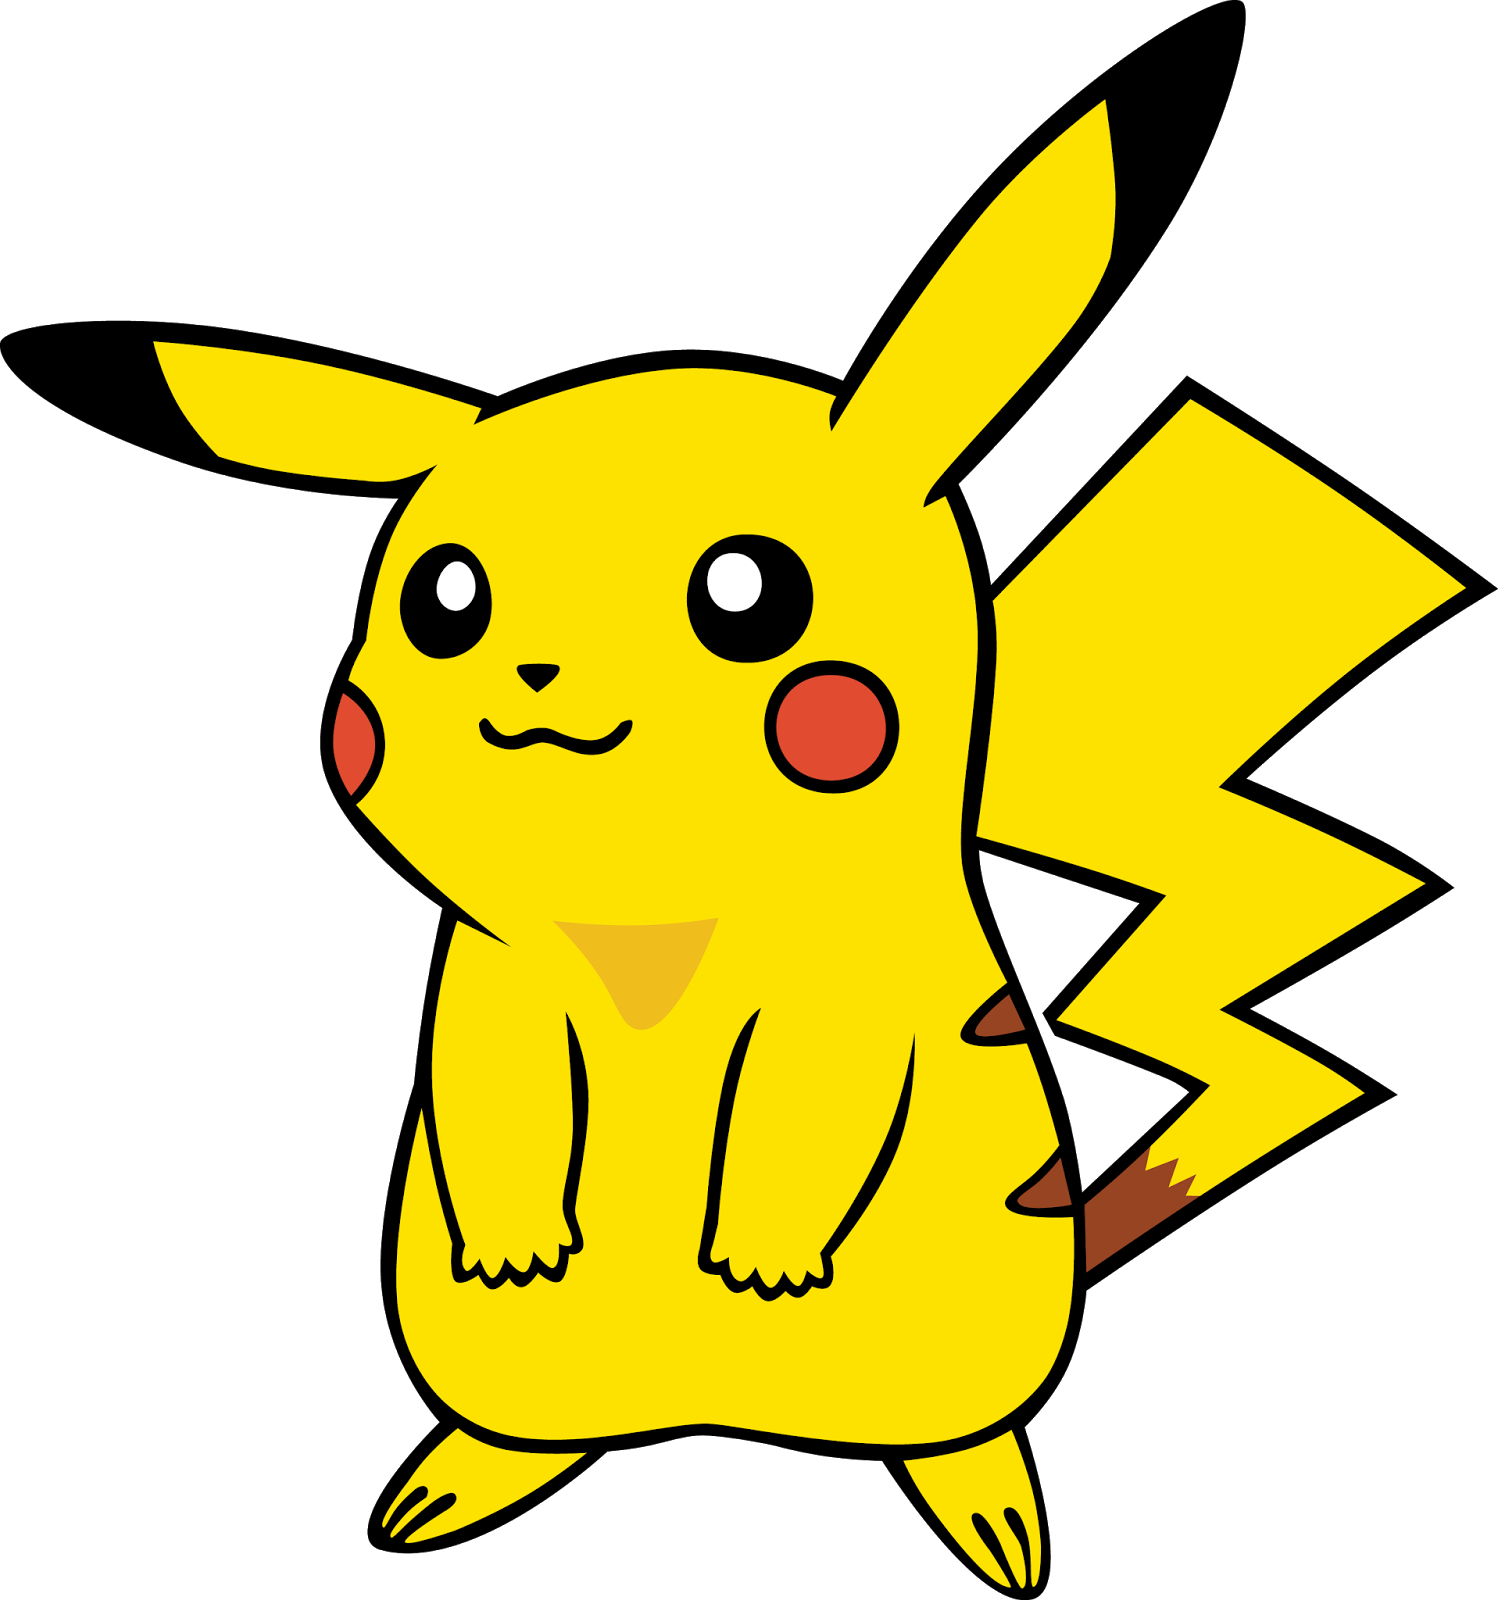 Pikachu free print jokingart. Pokeball clipart minecraft